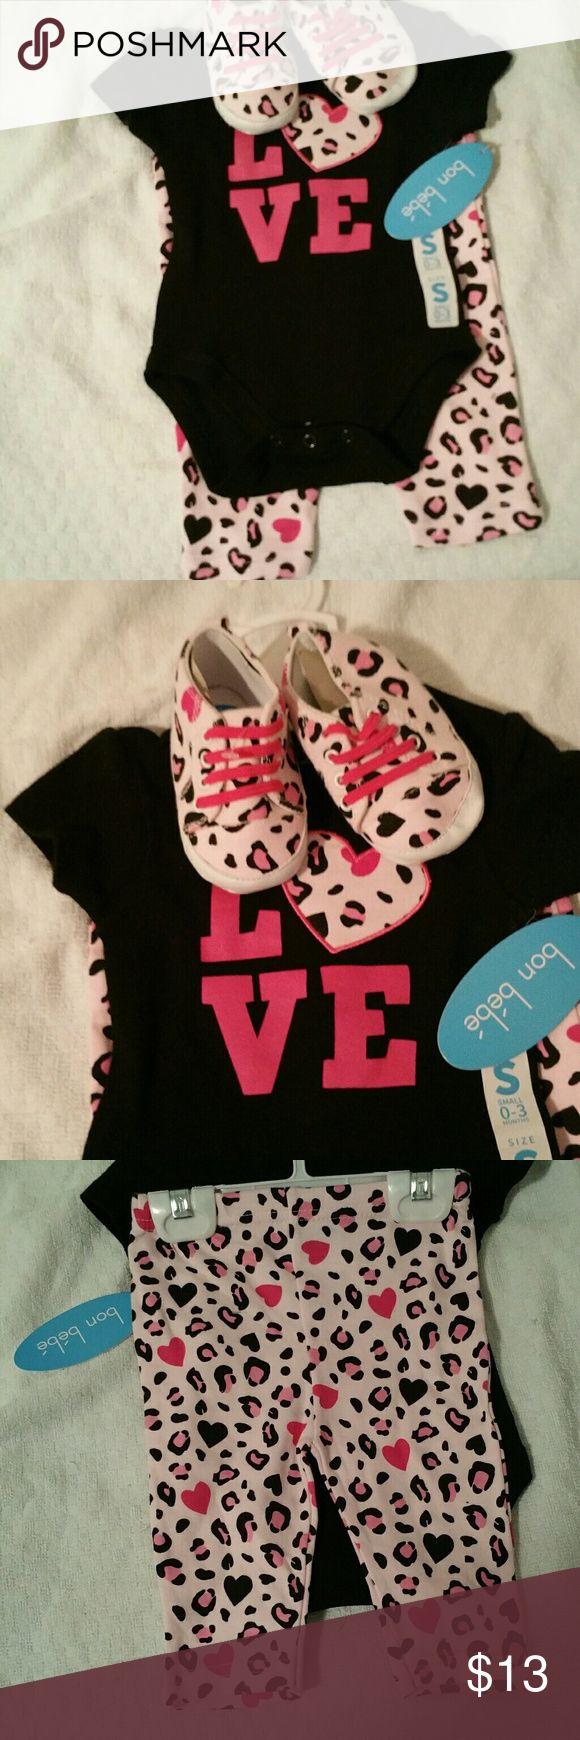 BNWT 3 pc Cheetah Outfit Short Sleeve Onsie, Pants & Shoes Bon Bebe Matching Sets